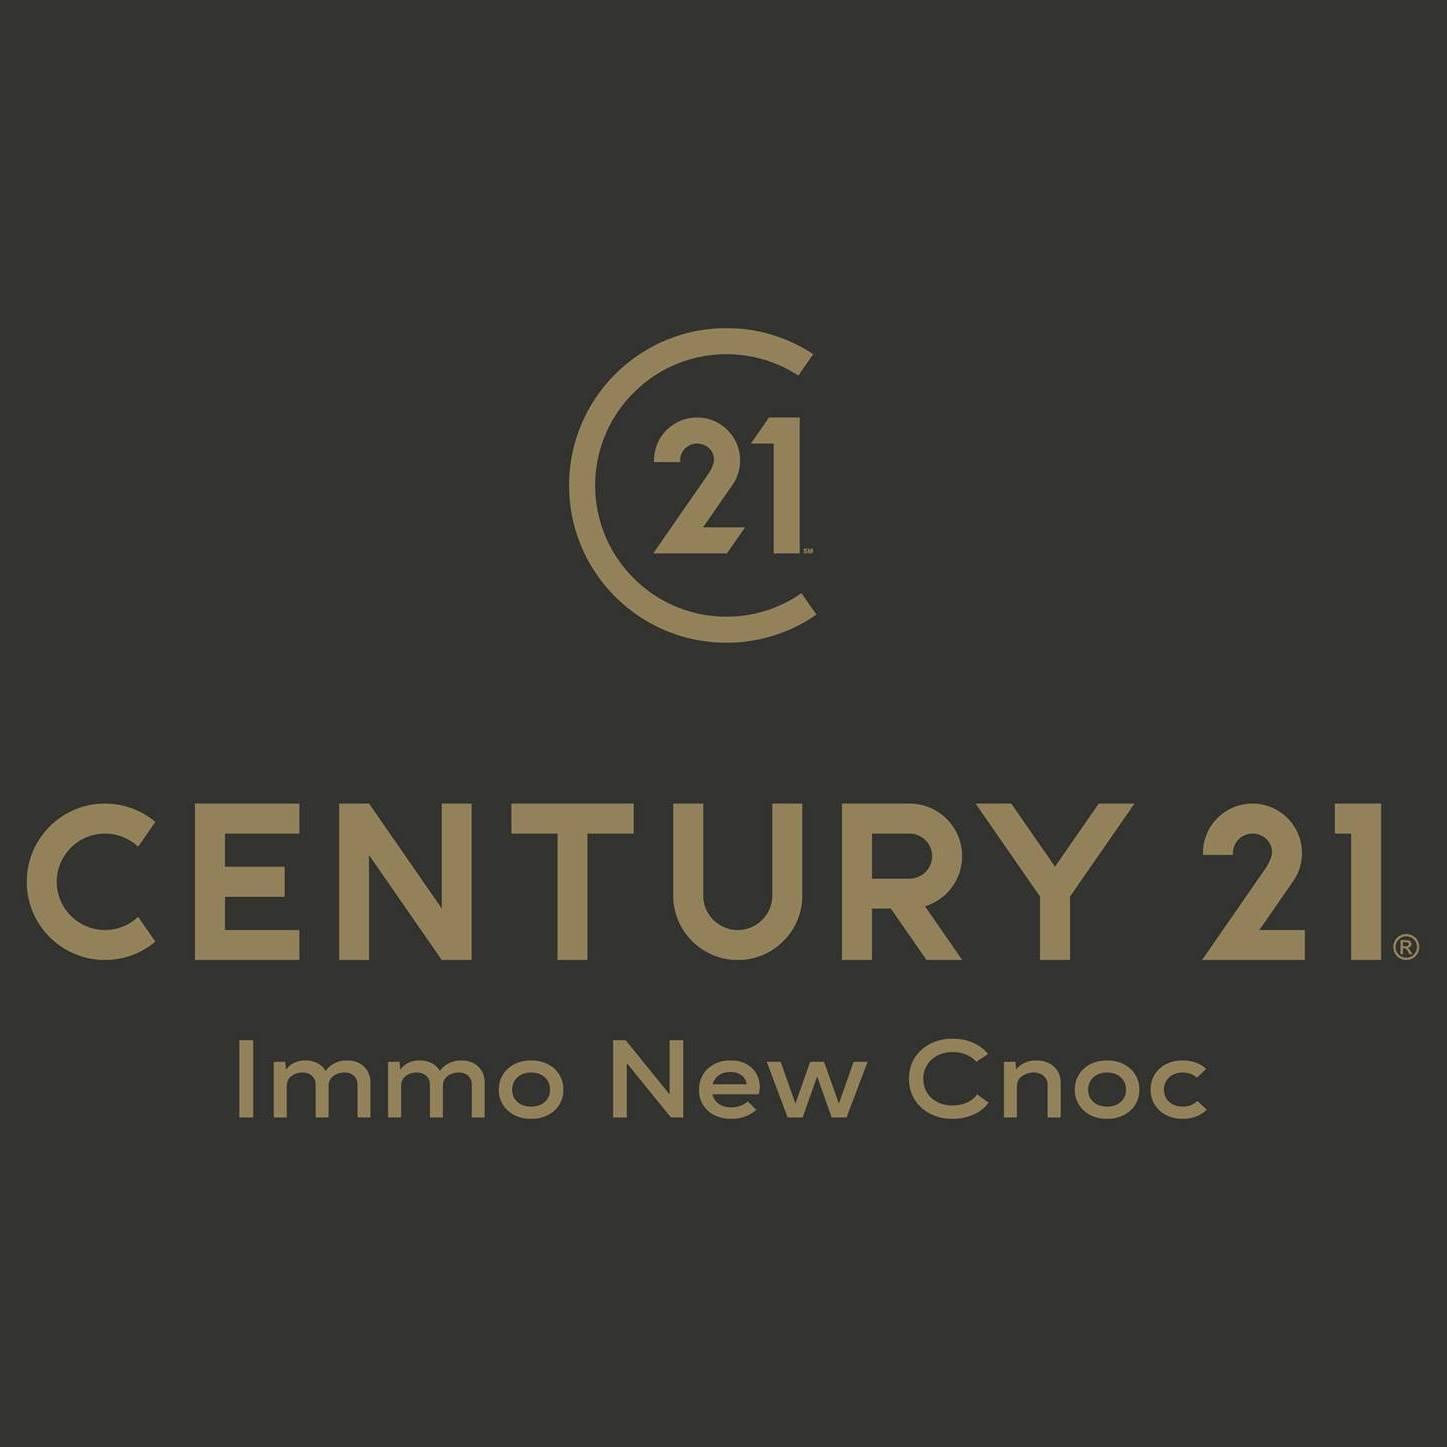 C21 Immo New Cnoc